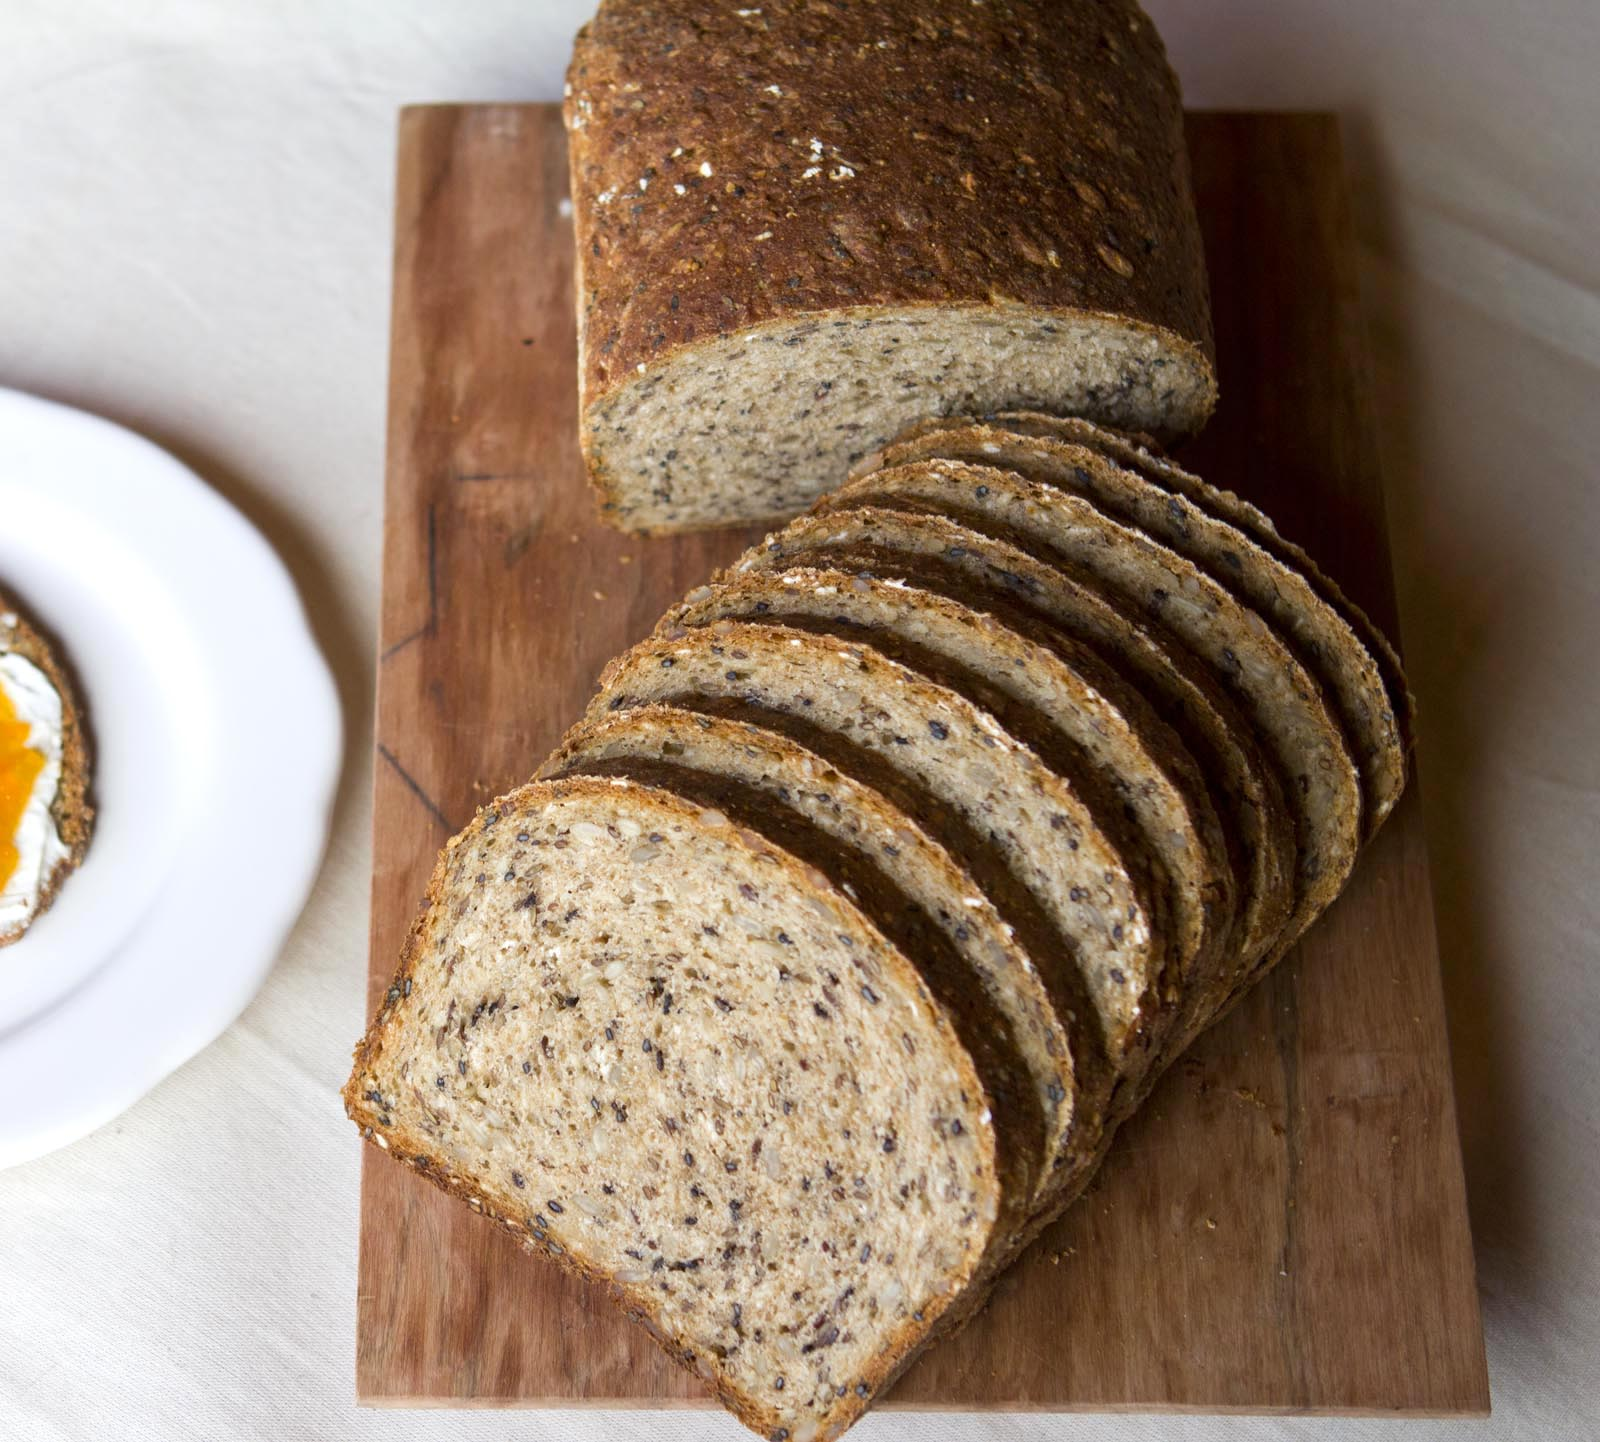 Receta pan integral con semillas